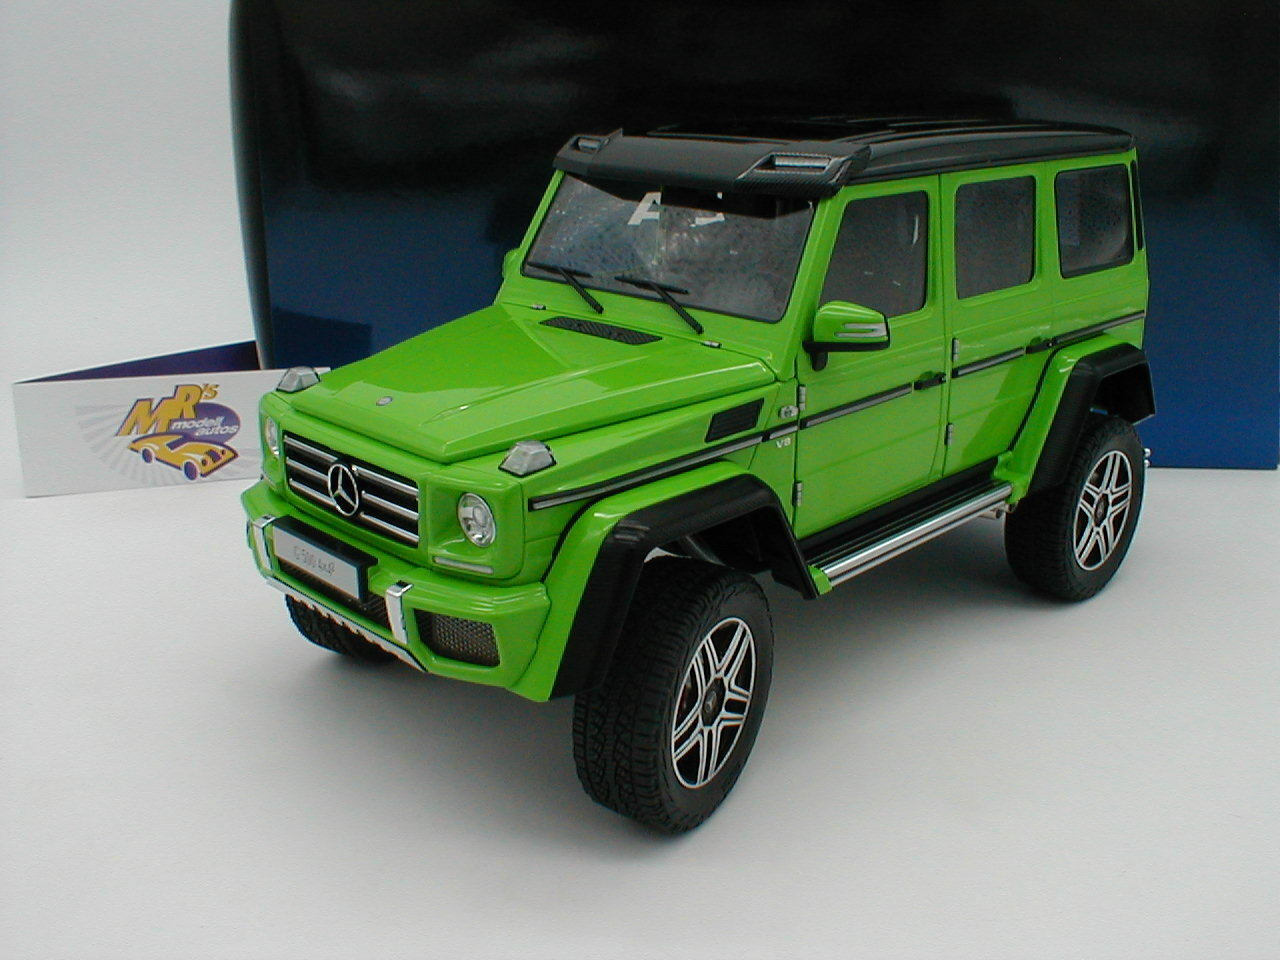 AUTOart 76315 - Mercedes-Benz G500 4x4² Baujahr 2015   Alien Grün   1 18  NEU